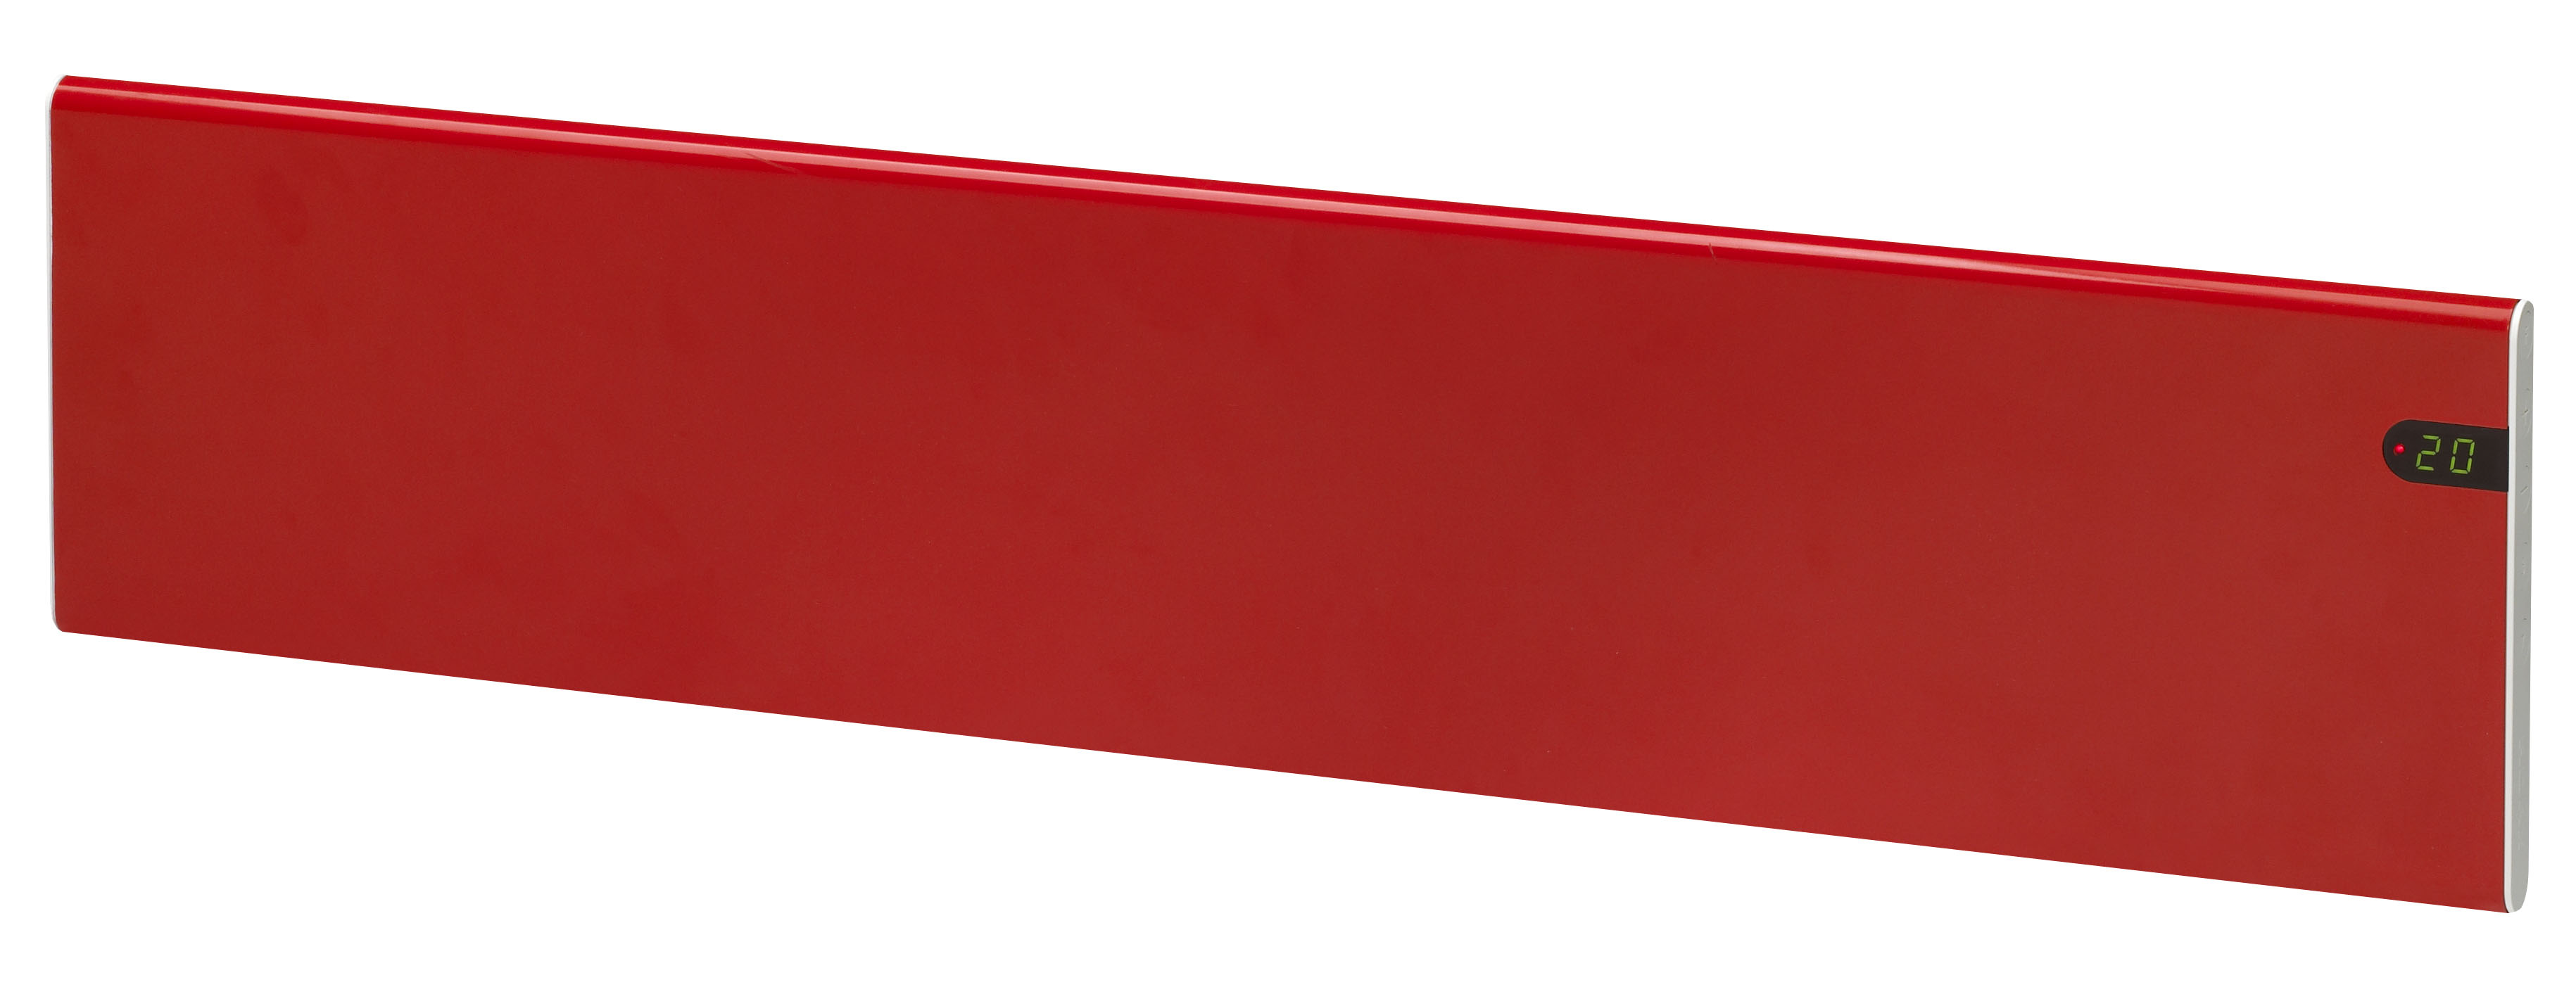 Elektrinis radiatorius ADAX NEO NL 06 KDT Red